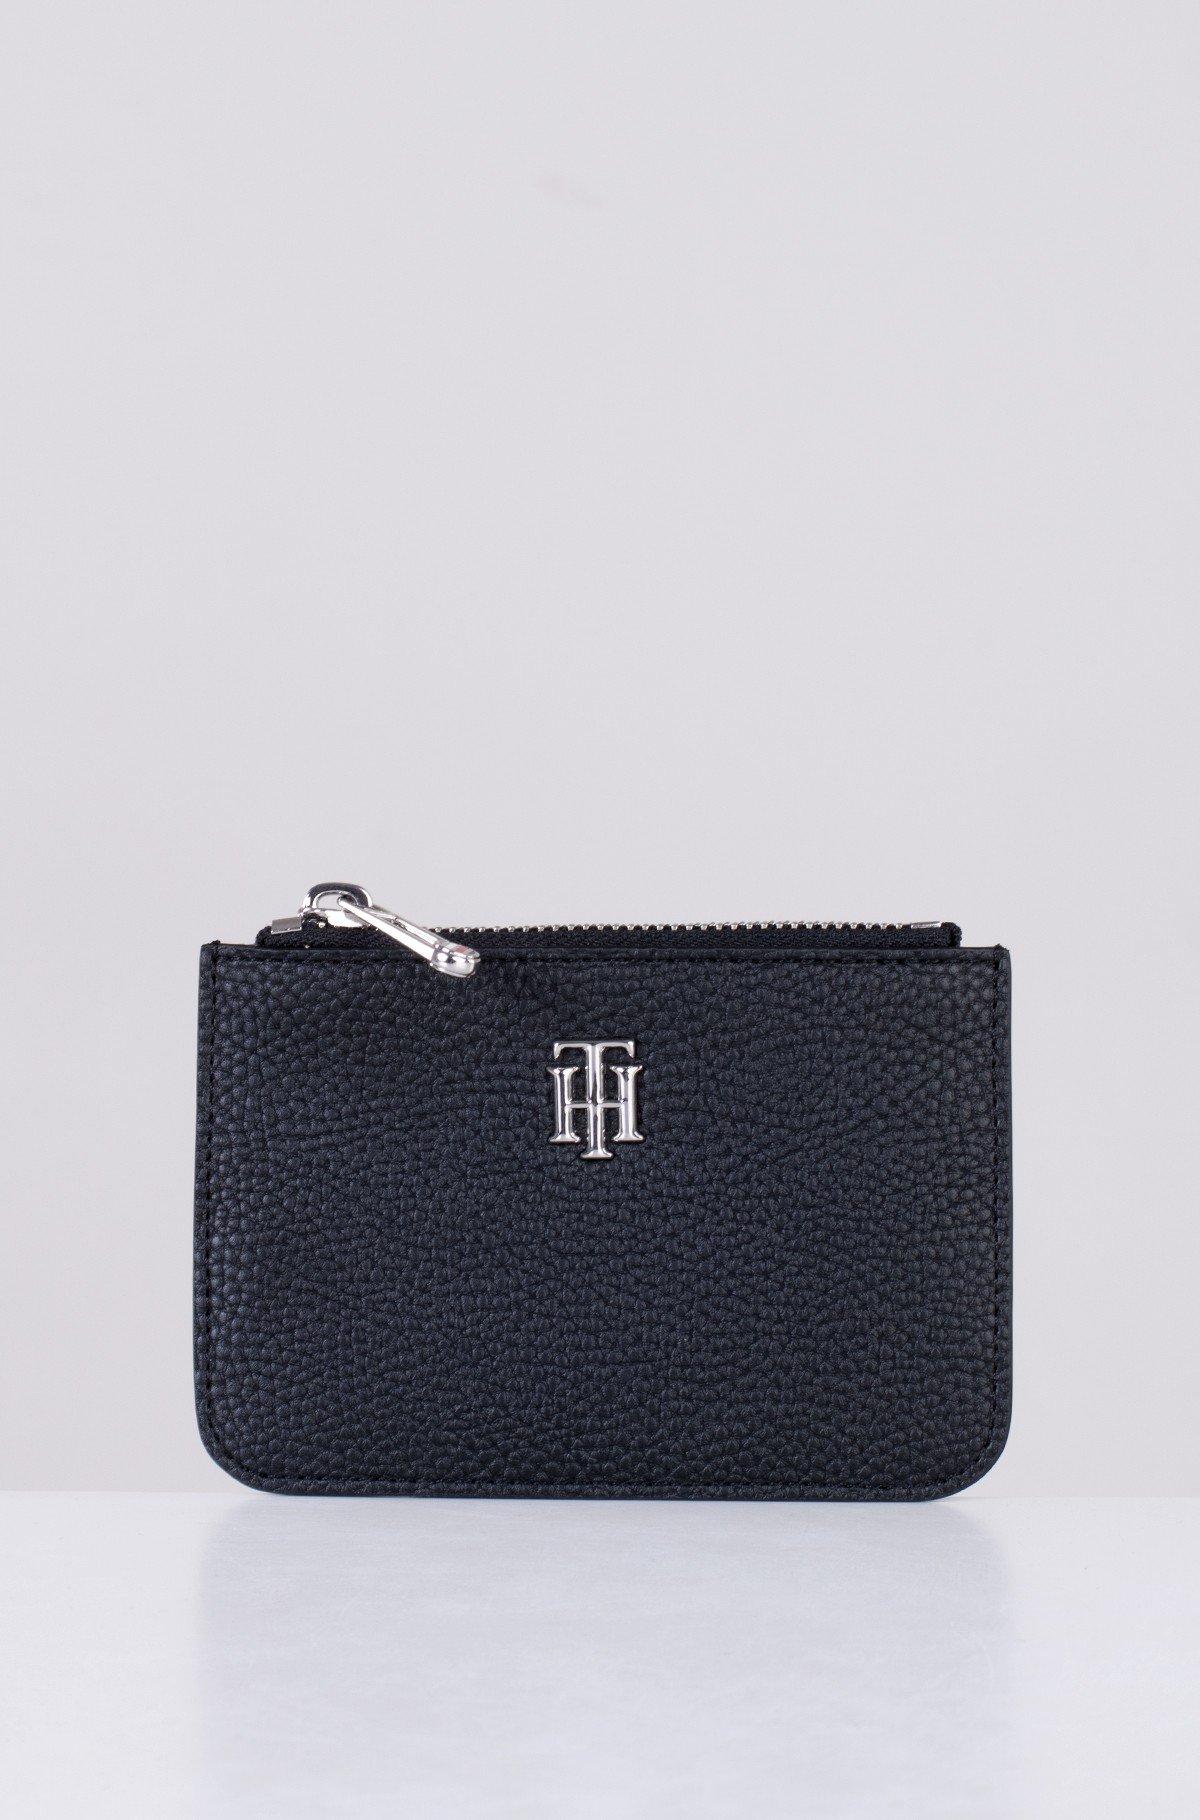 Wallet TH ELEMENT CC HOLDER-full-1